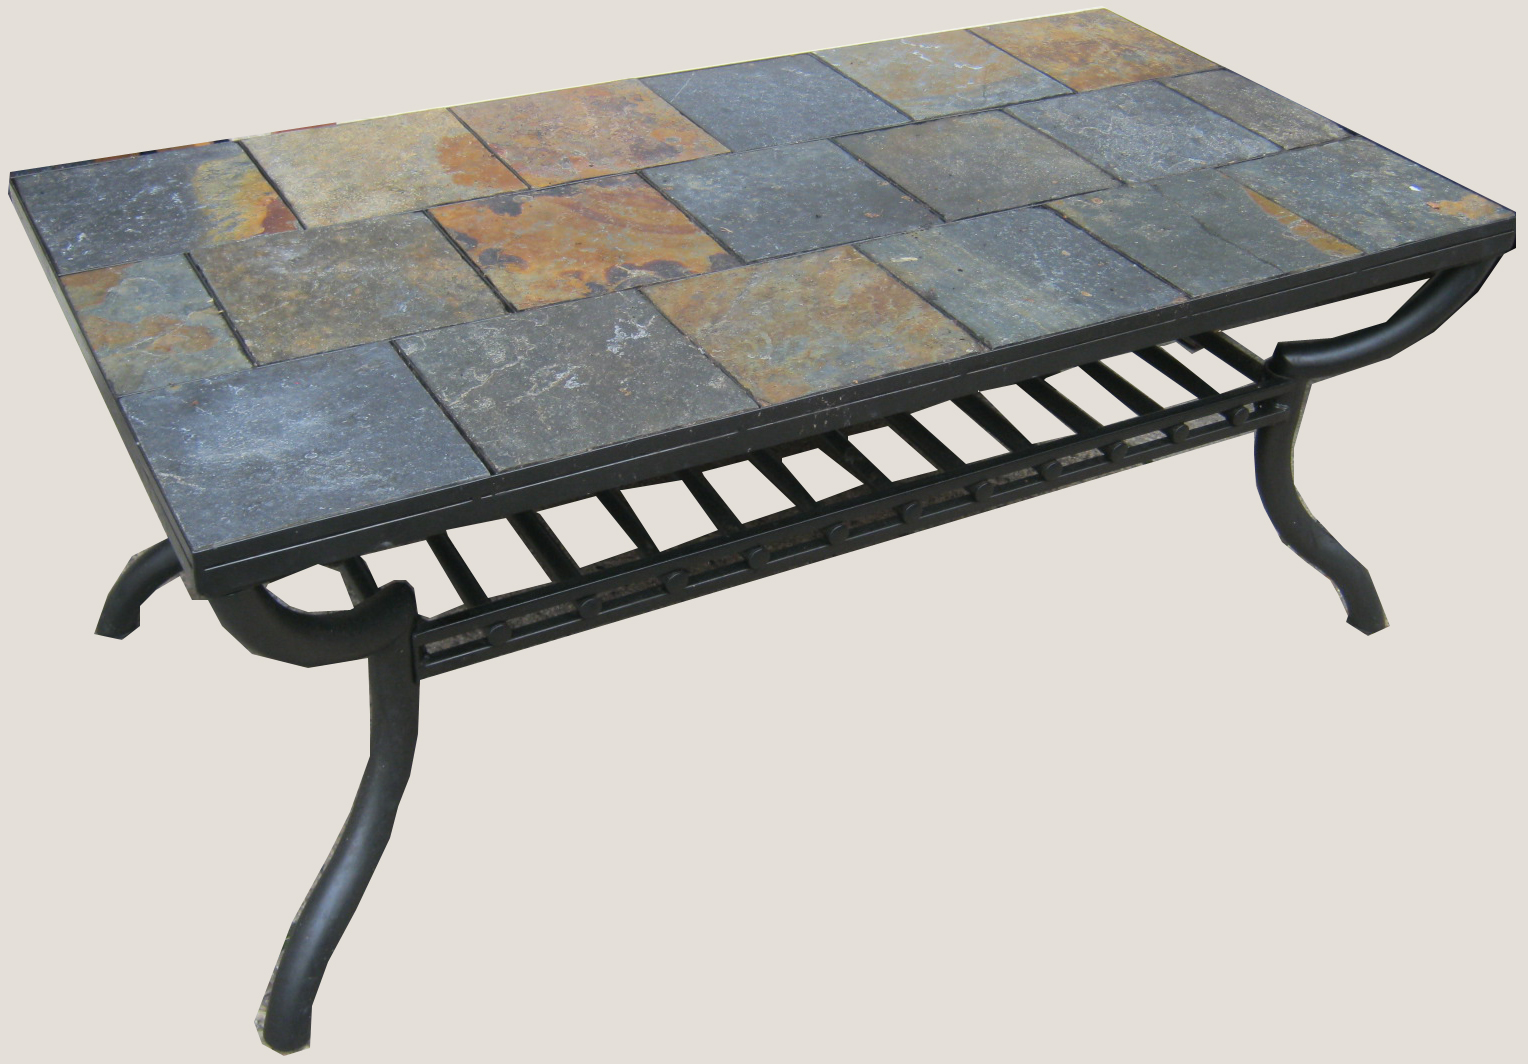 Slate Tile Coffee Table SOLD